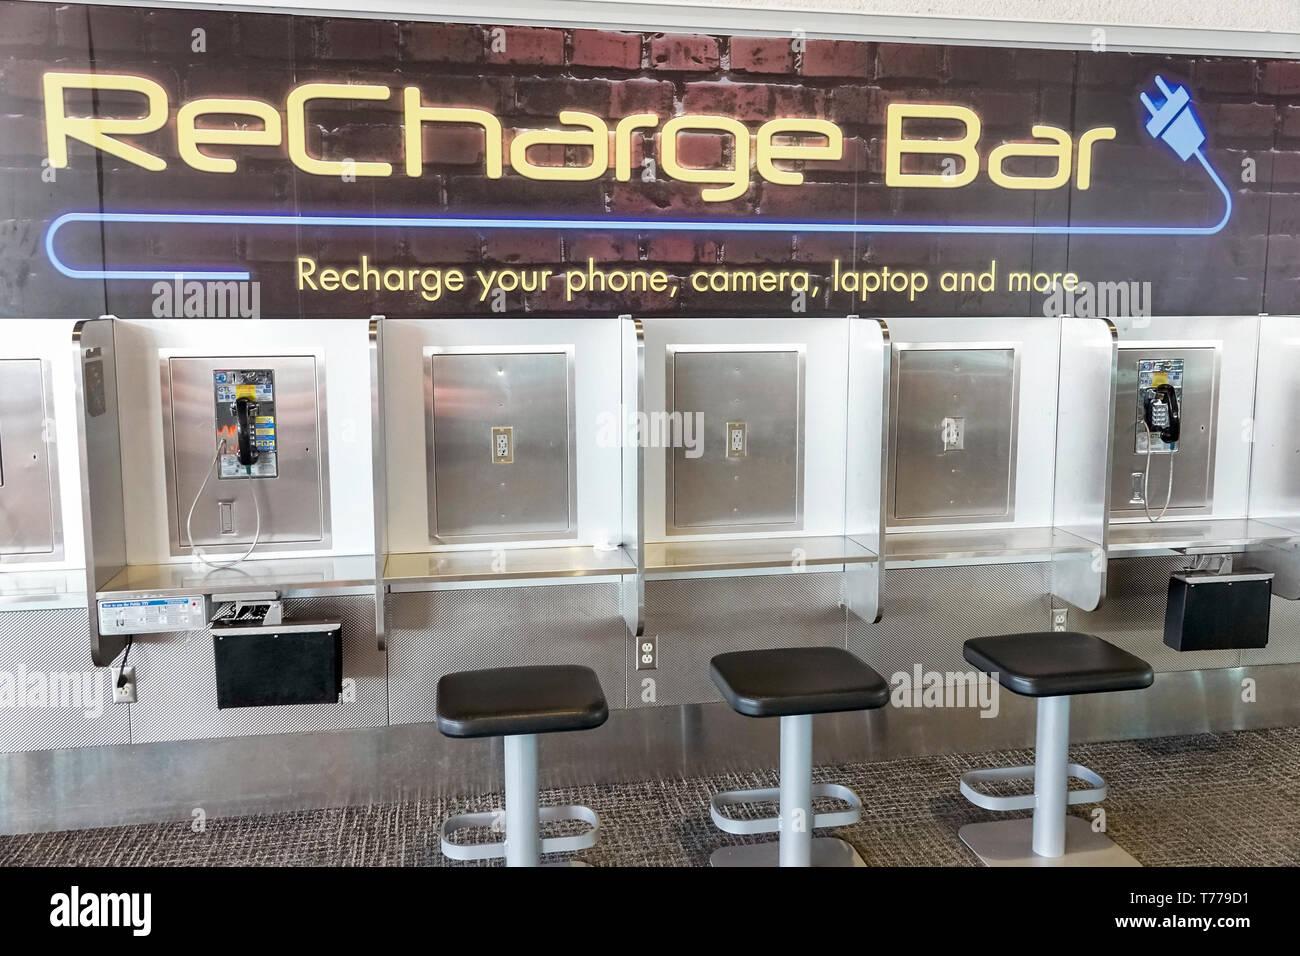 Miami Florida Miami International Airport MIA phone laptop battery recharge bar free convenience - Stock Image